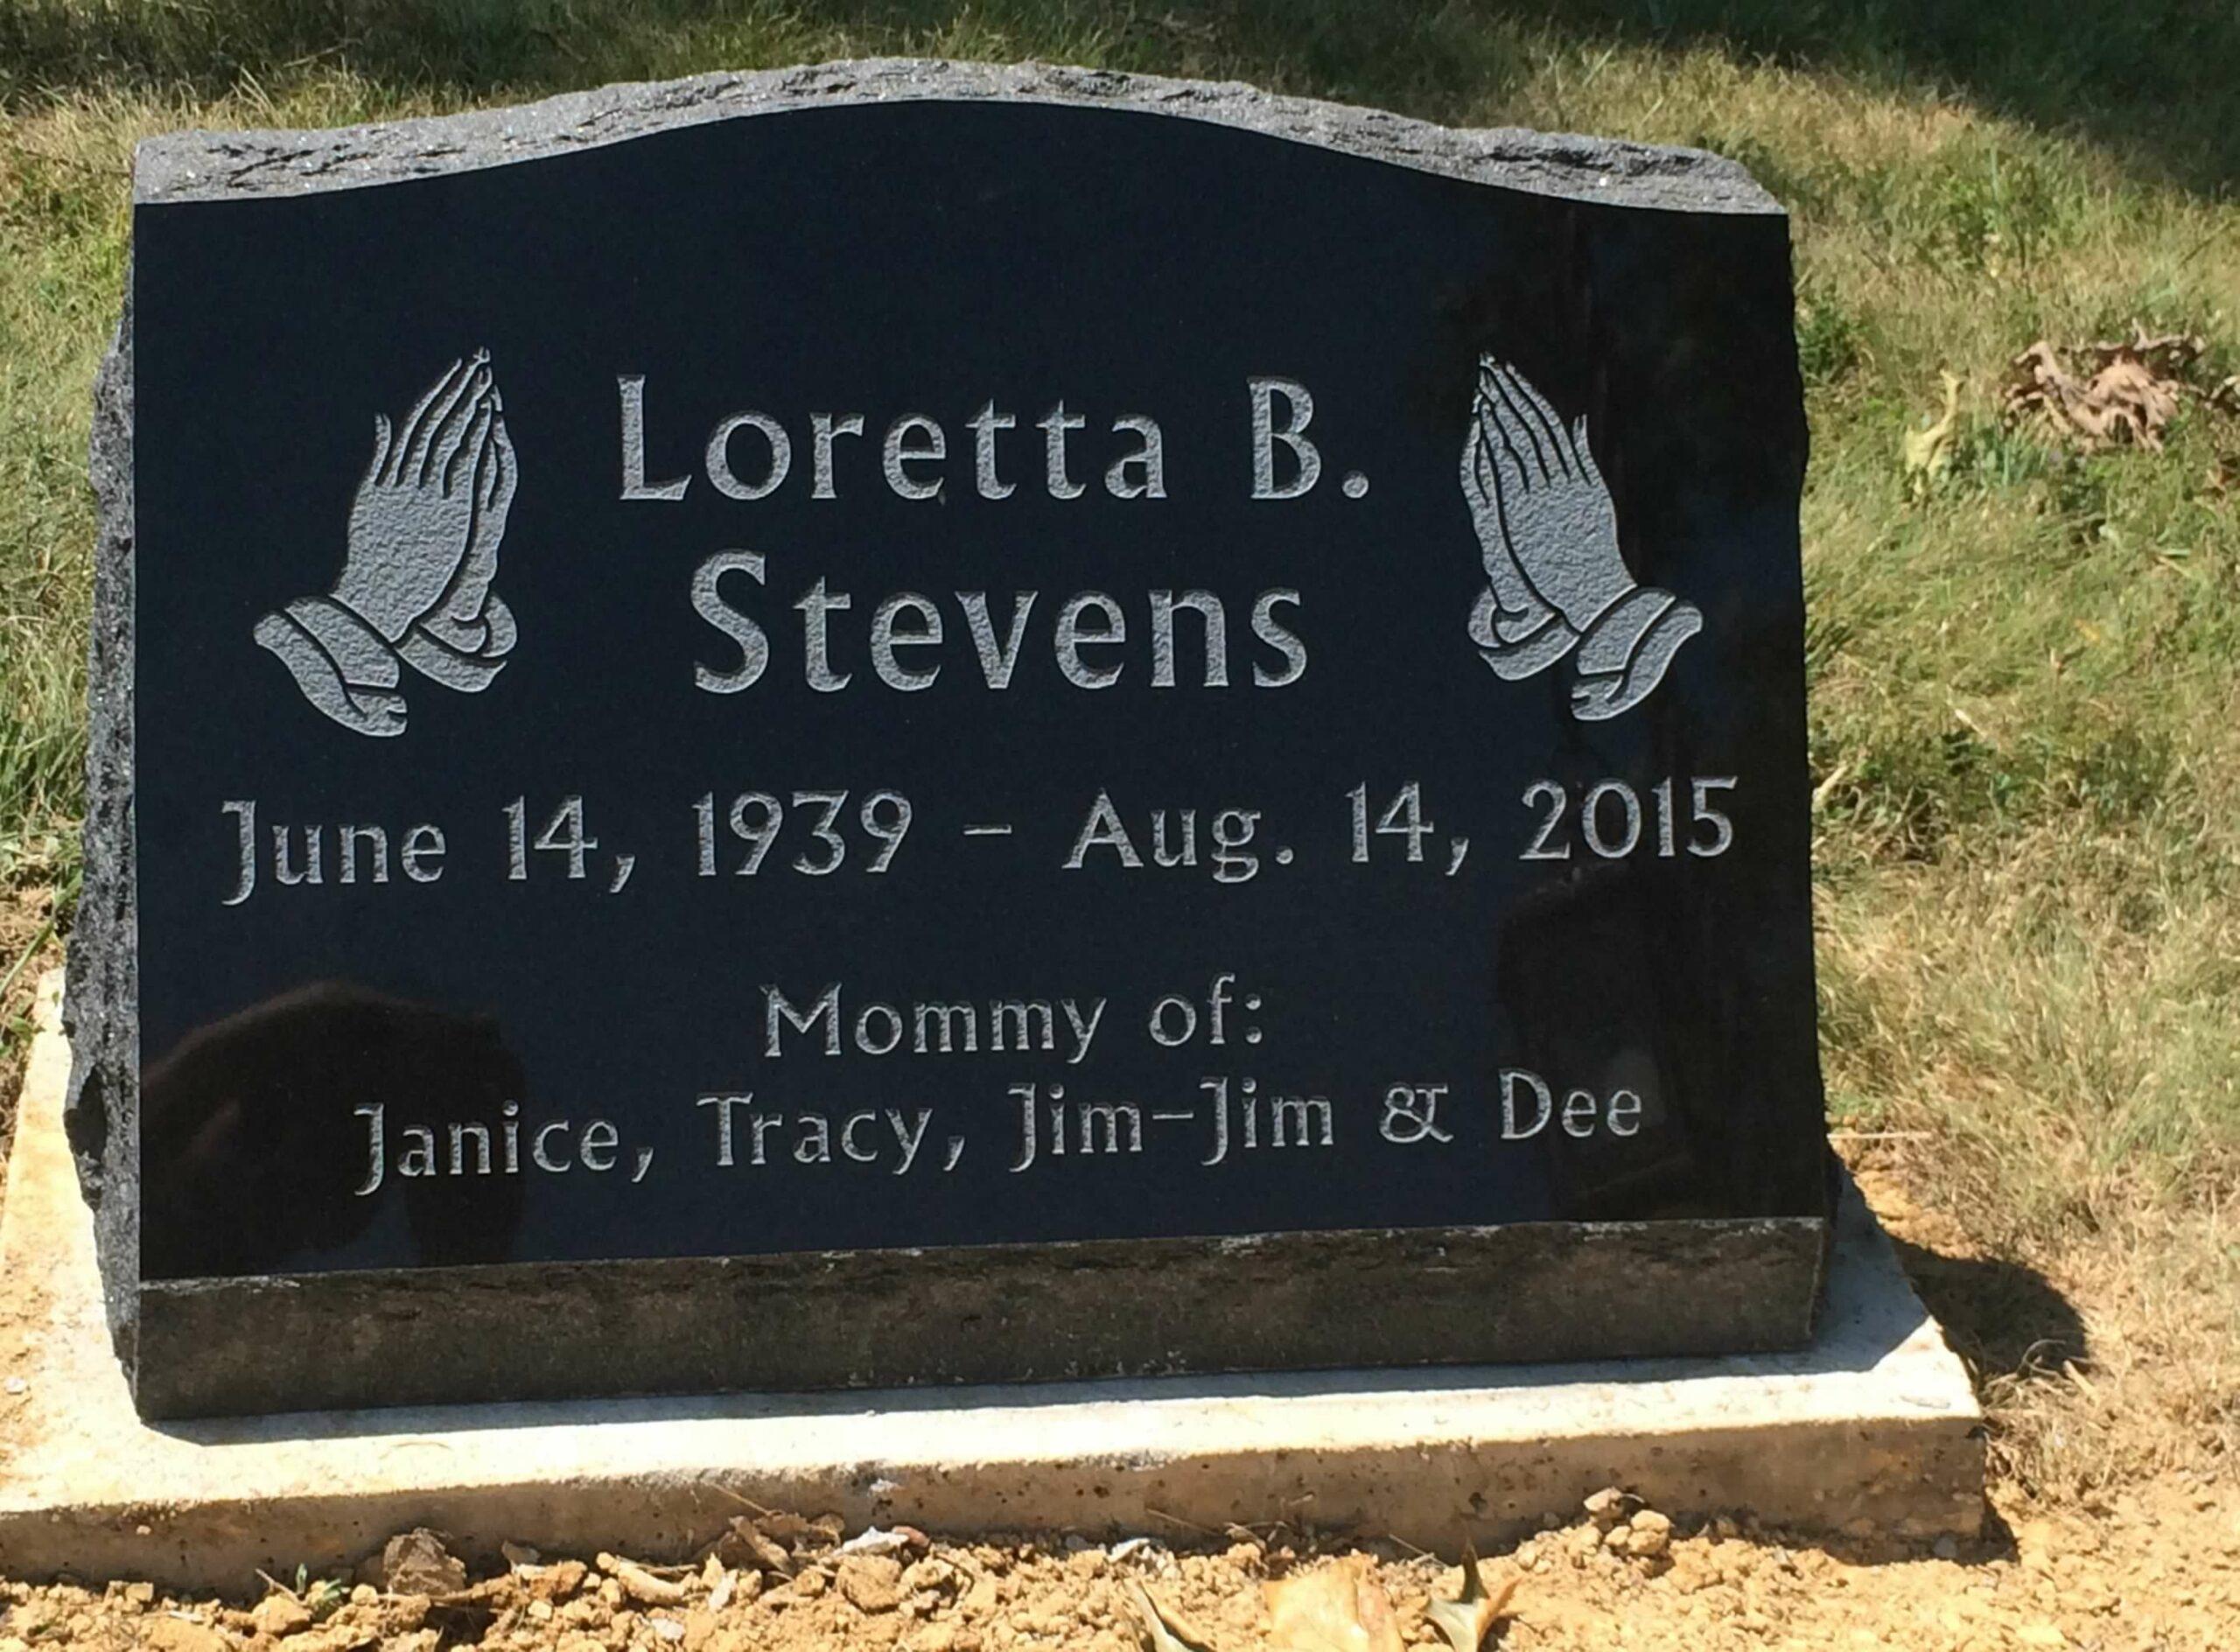 Stevens, Loretta - Southland Mission Cem., 2-0, Jet Black